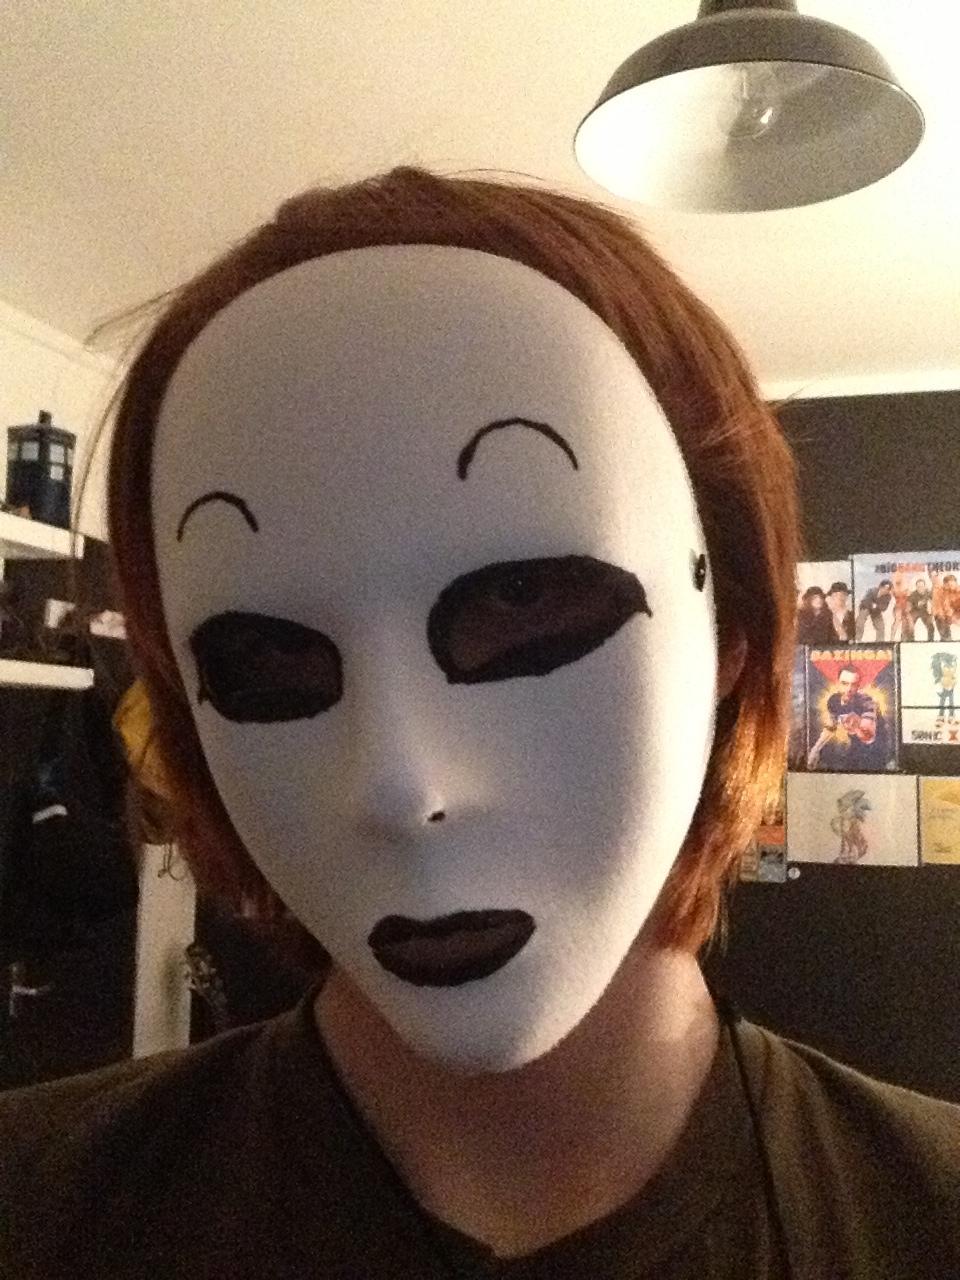 marble hornets masky mask by artisticharry on deviantart